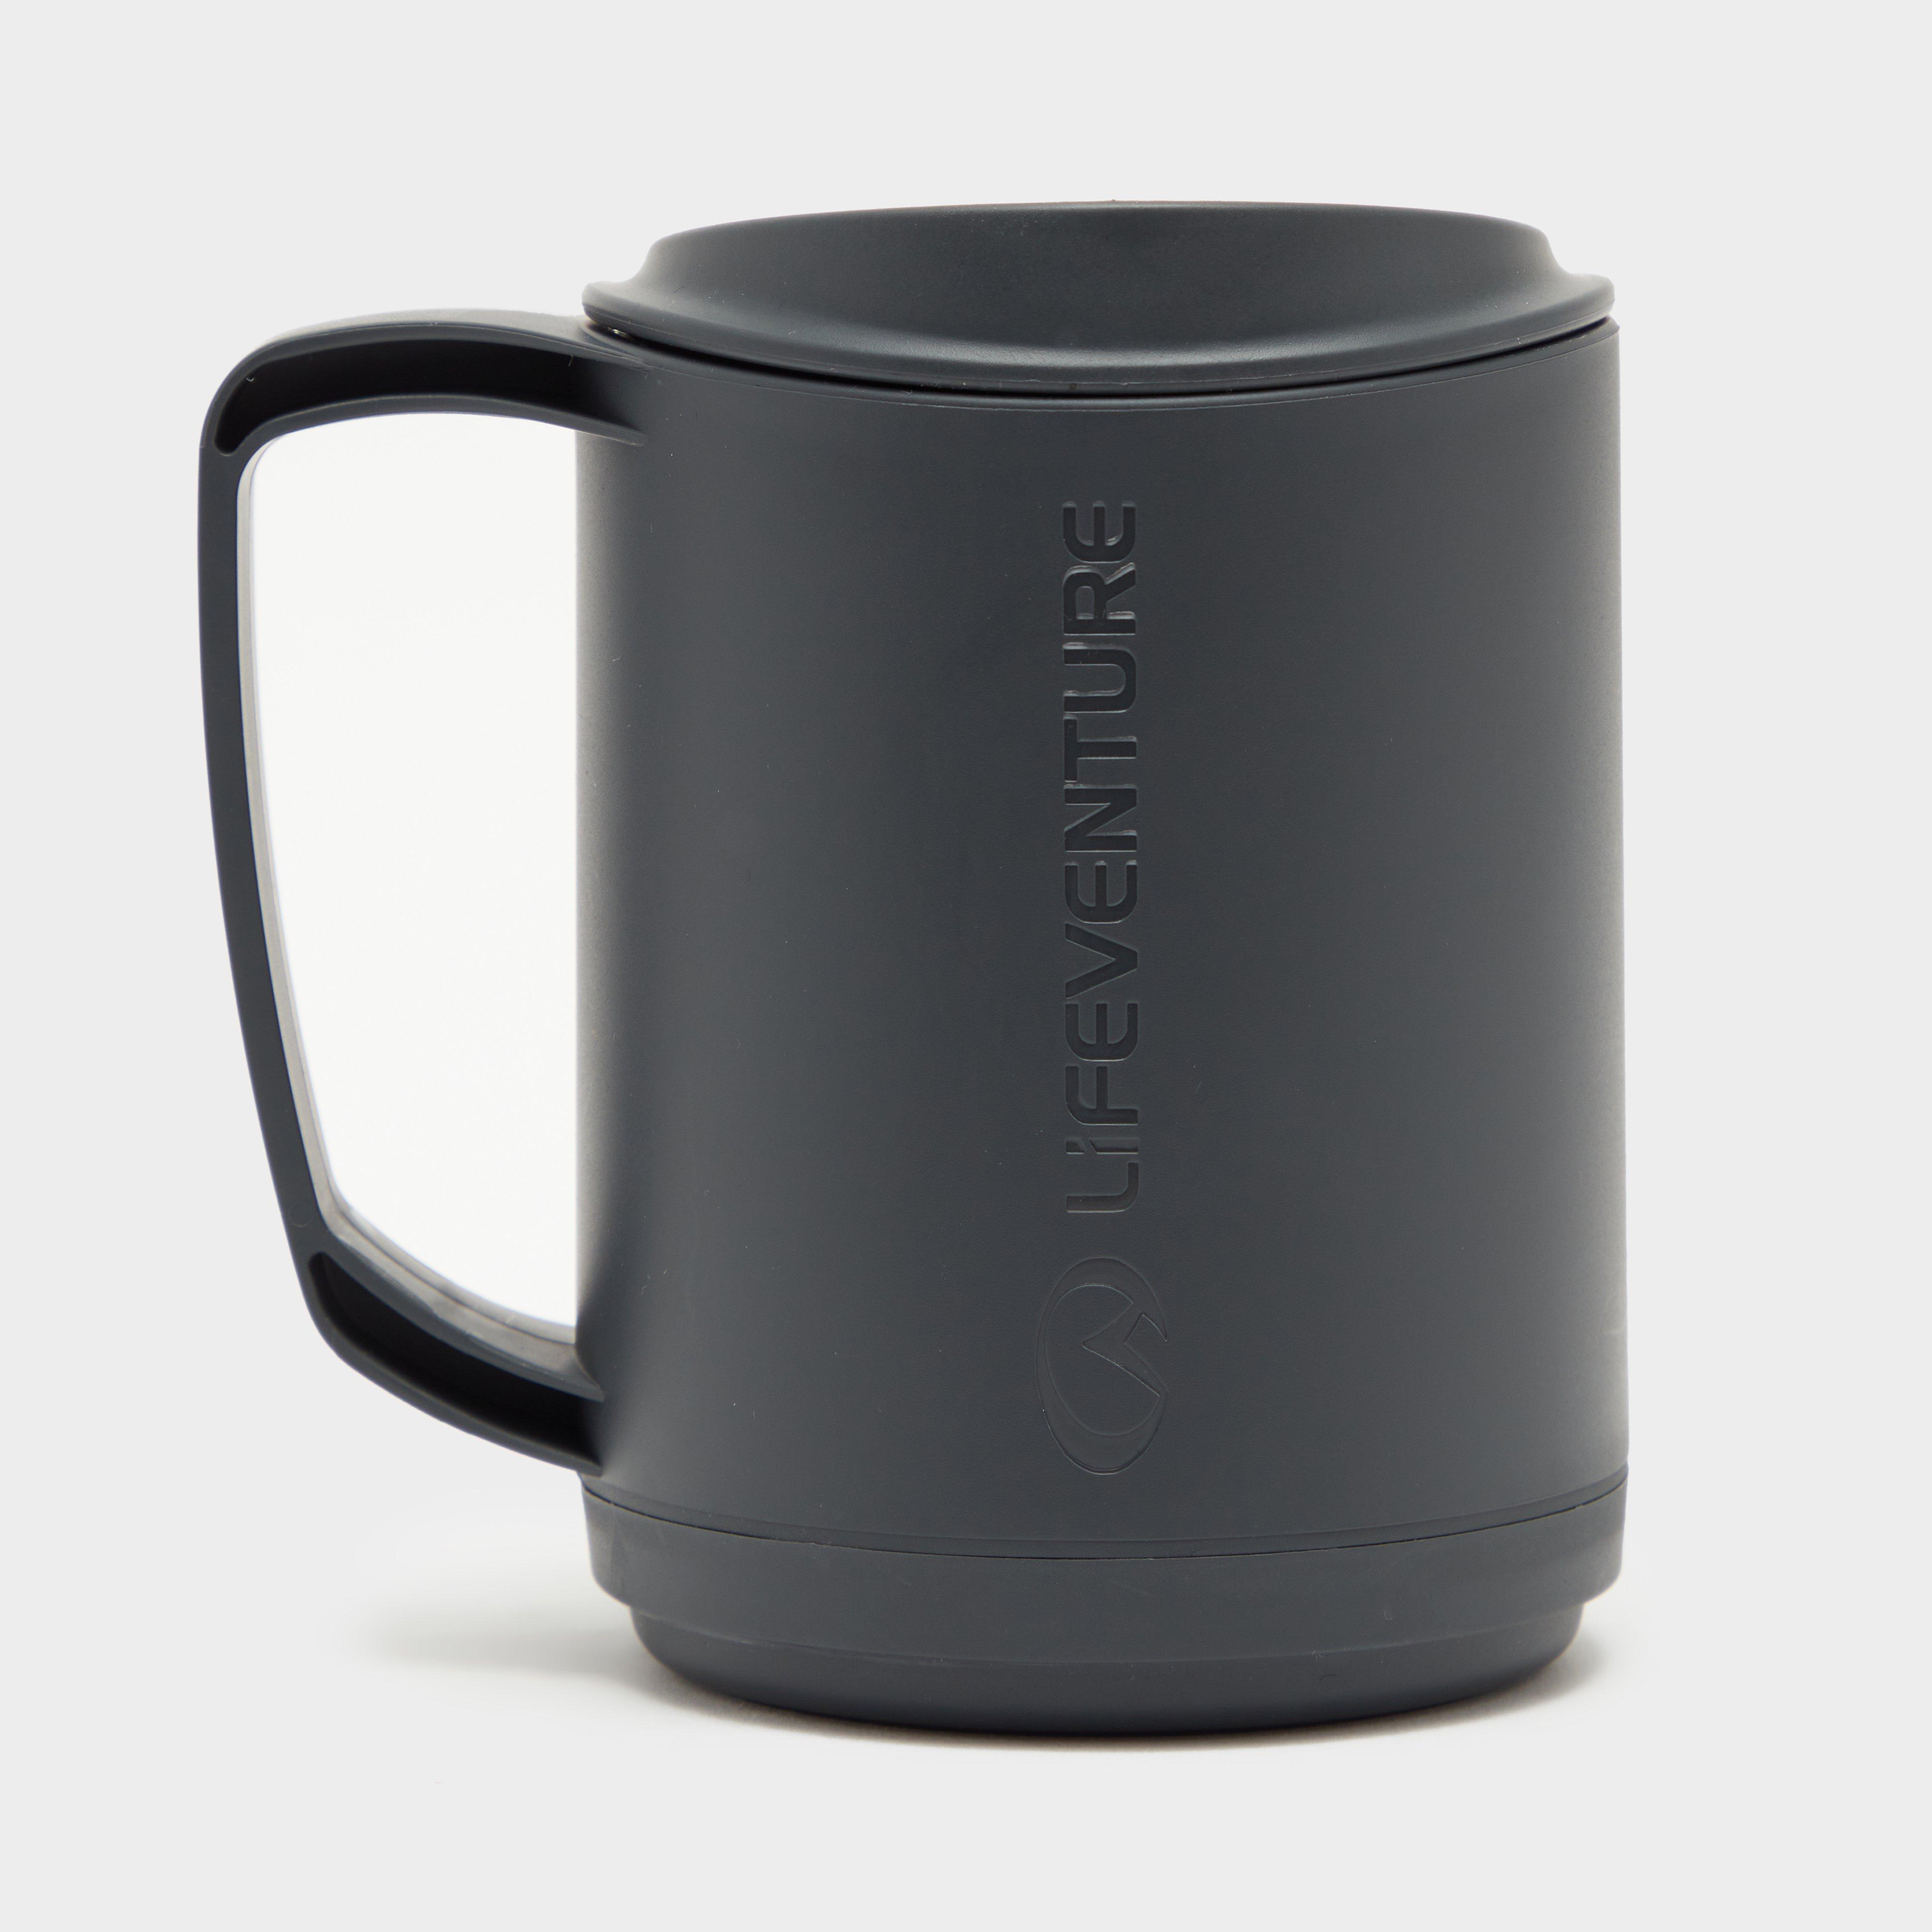 Lifeventure Lifeventure Ellipse Insulated Mug - Grey, Grey